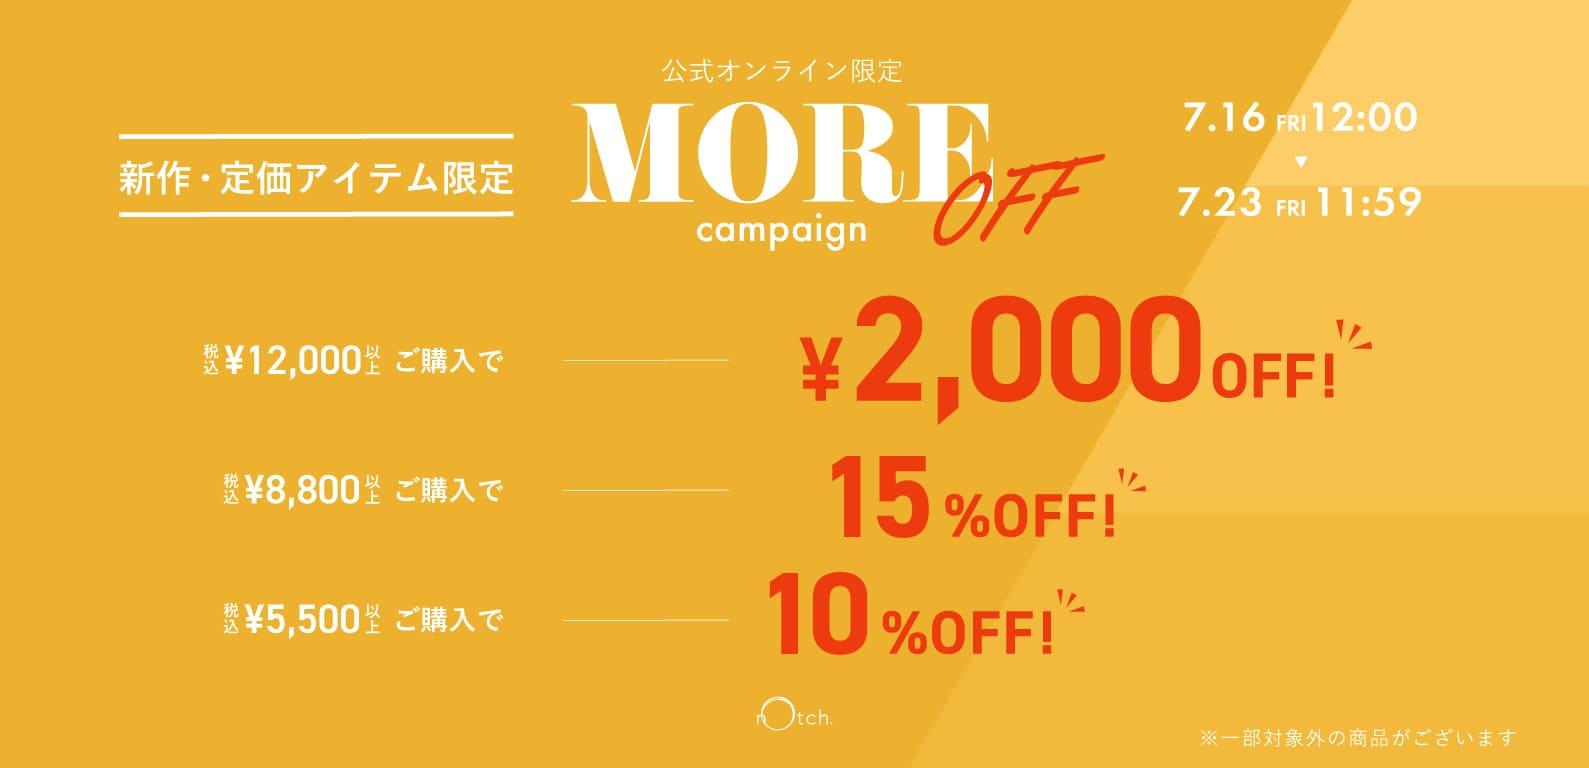 notch. | MORE OFF キャンペーン